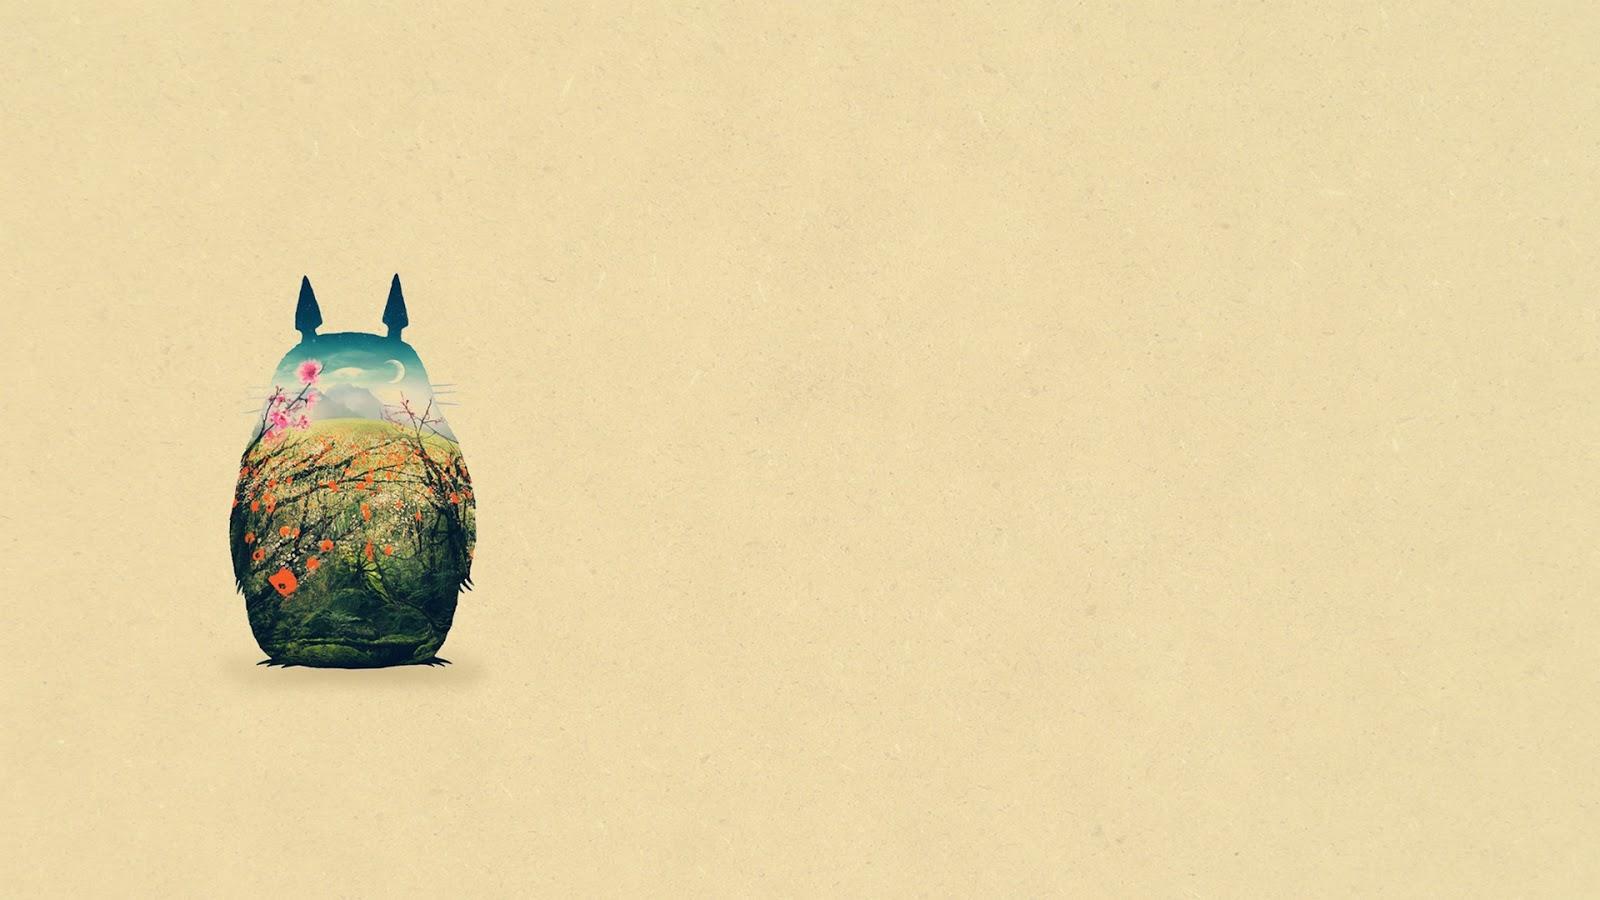 Anime Wallpapers My Neighbor Totoro   Anime Wallpaper 1600x900